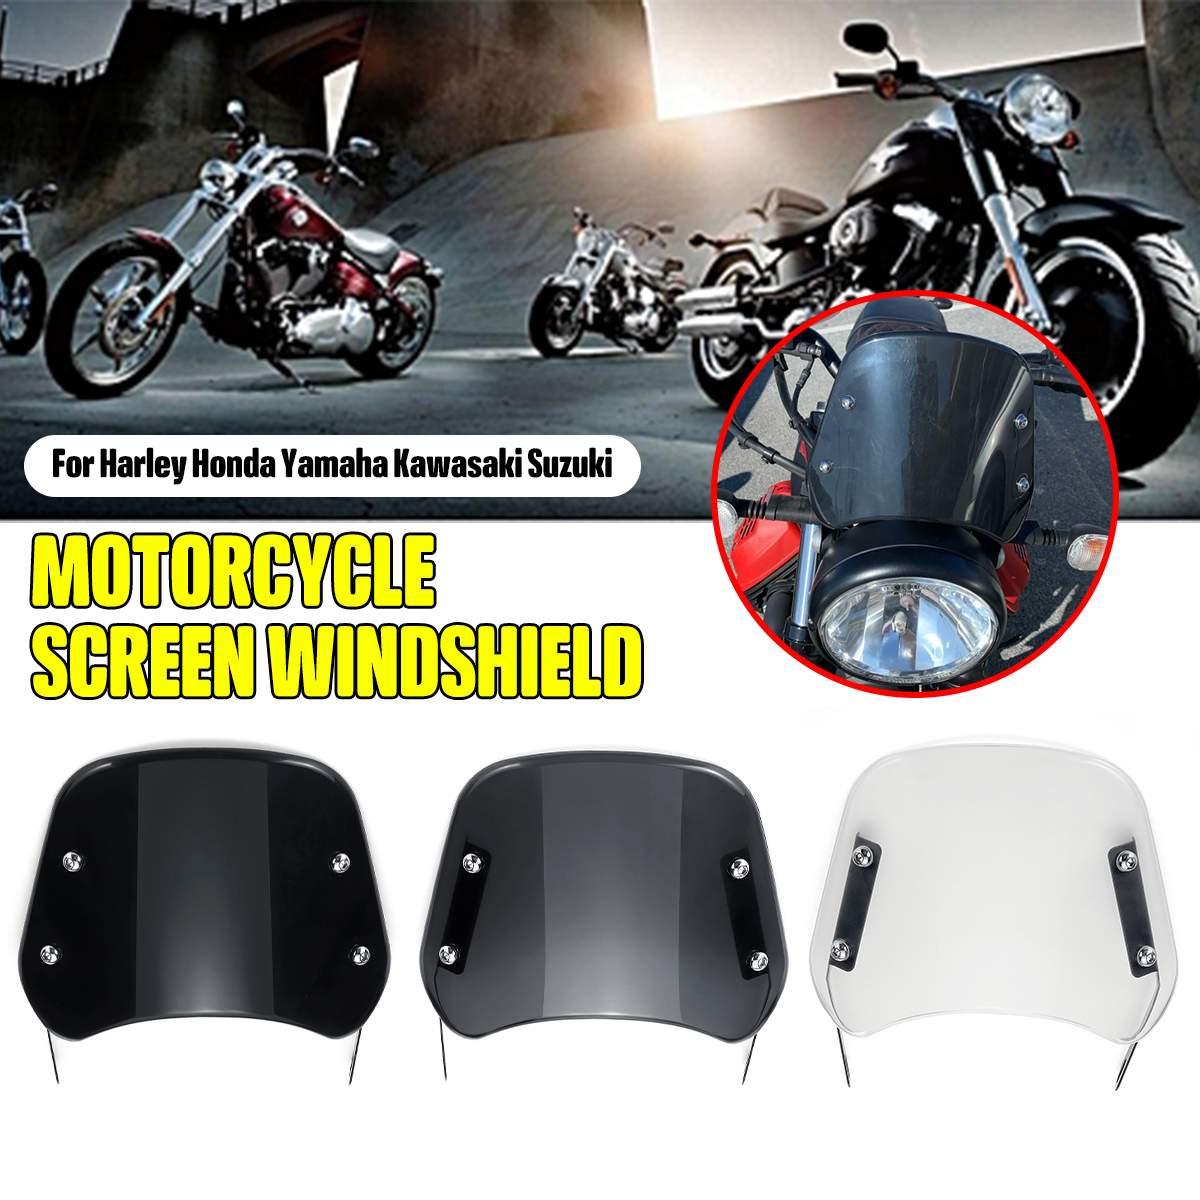 "Faro delantero para motocicleta de 6,5 ""-9,45"", Deflector de viento para parabrisas, faro Universal para Honda yamaha Kawasakis Suzukis"